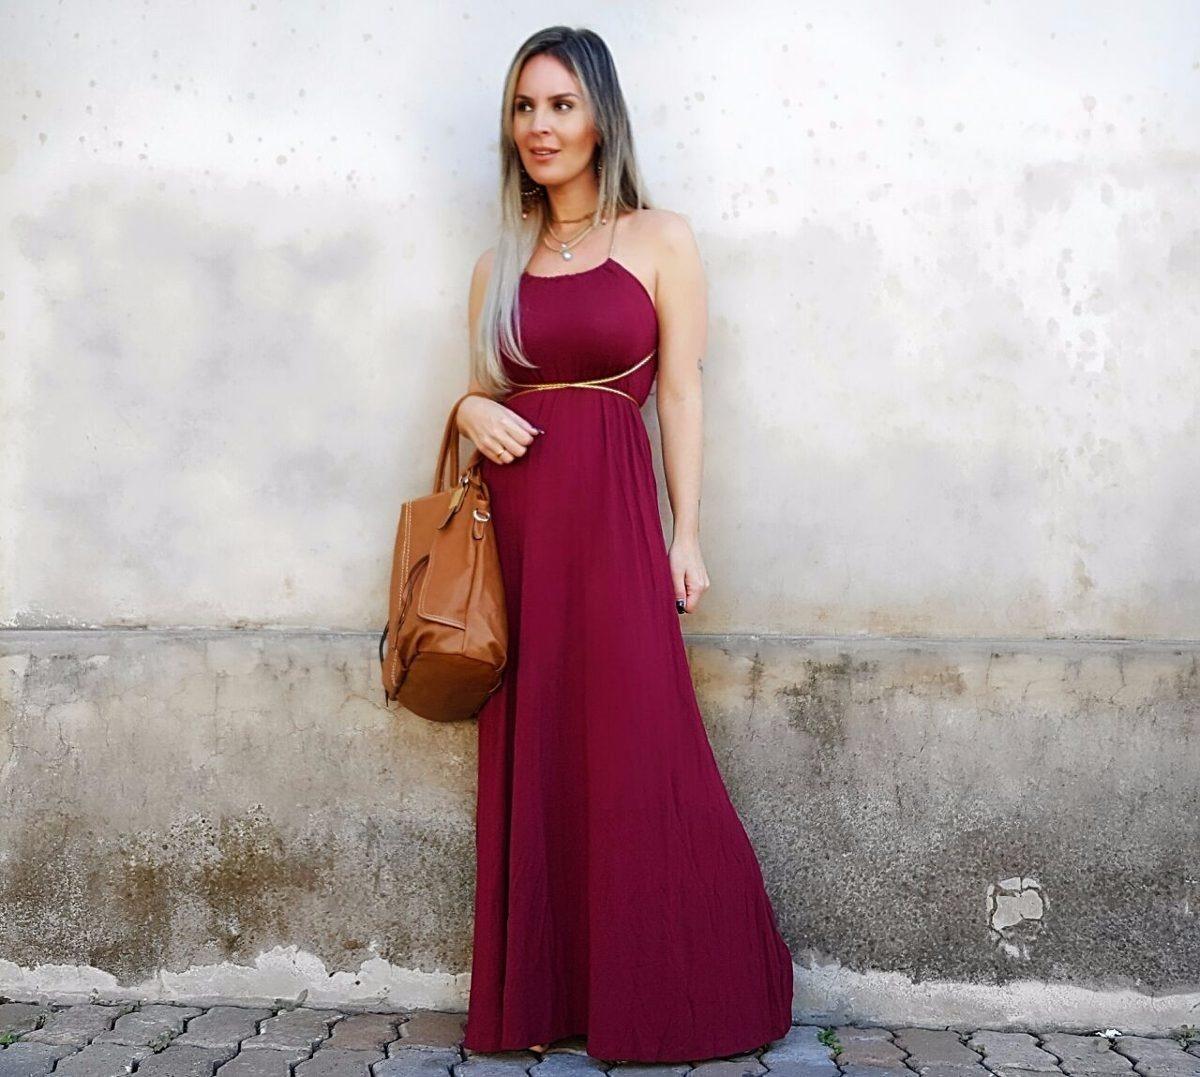 ff16375574 roupas femininas vestido longo estampado florido c  bojo 703. Carregando  zoom.